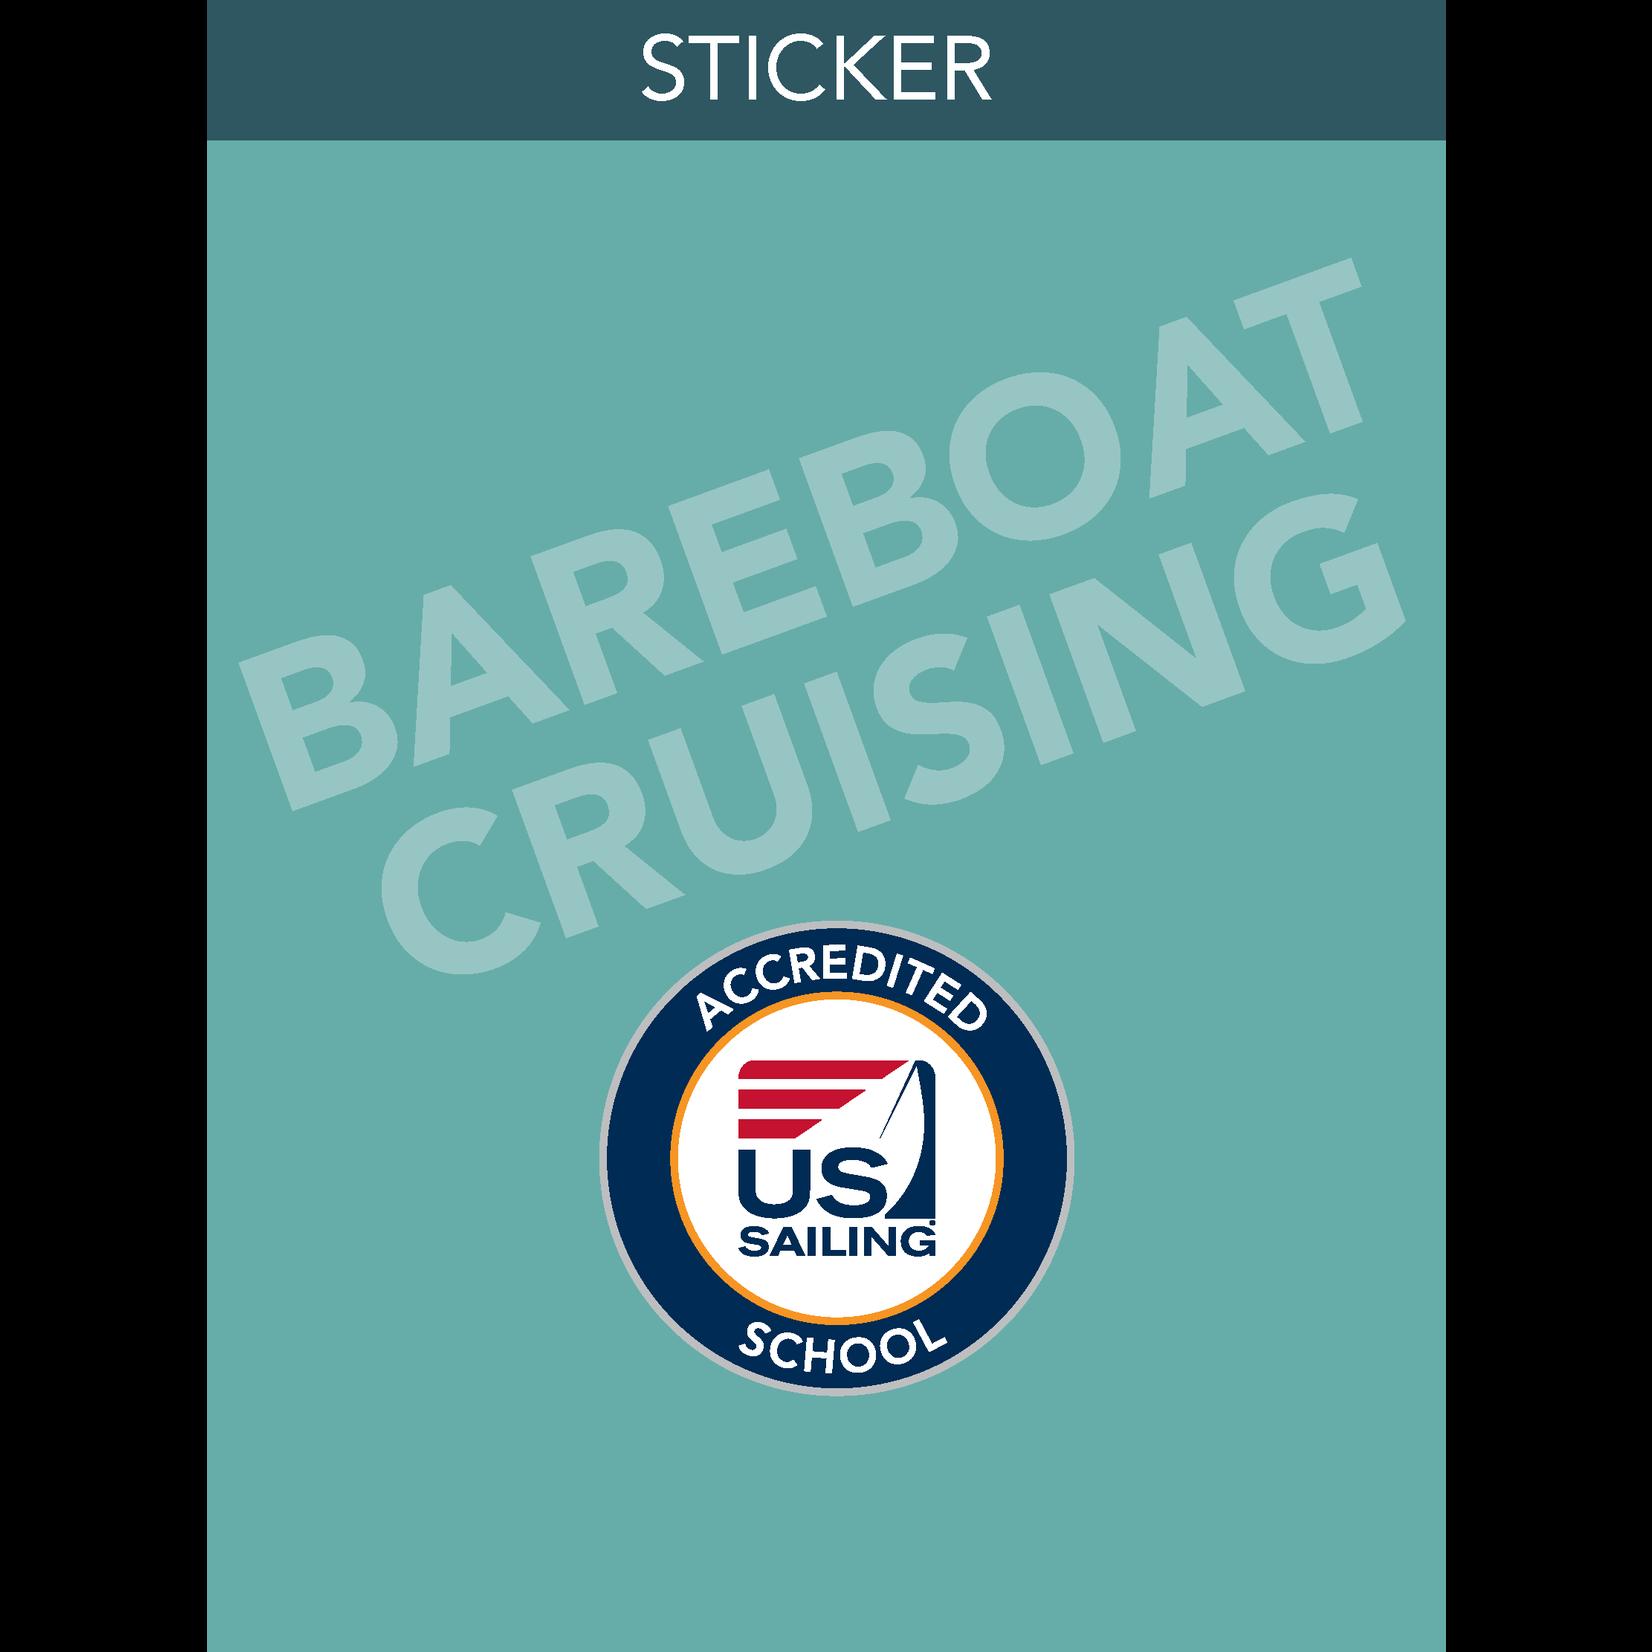 Bareboat Cruising Sticker